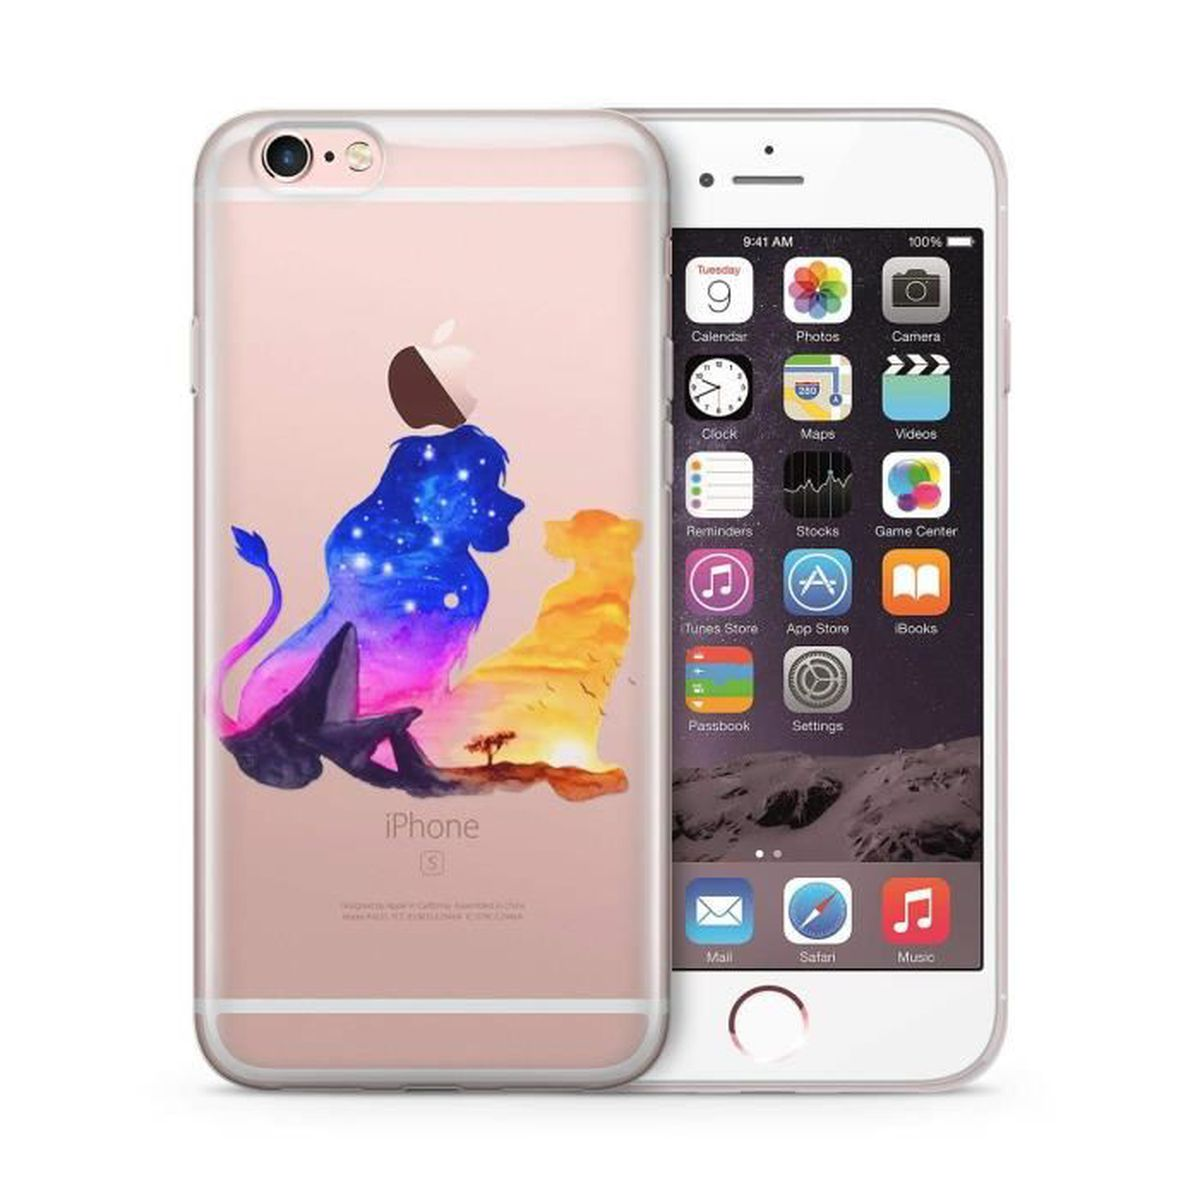 Coque iphone 4s en silicone lion